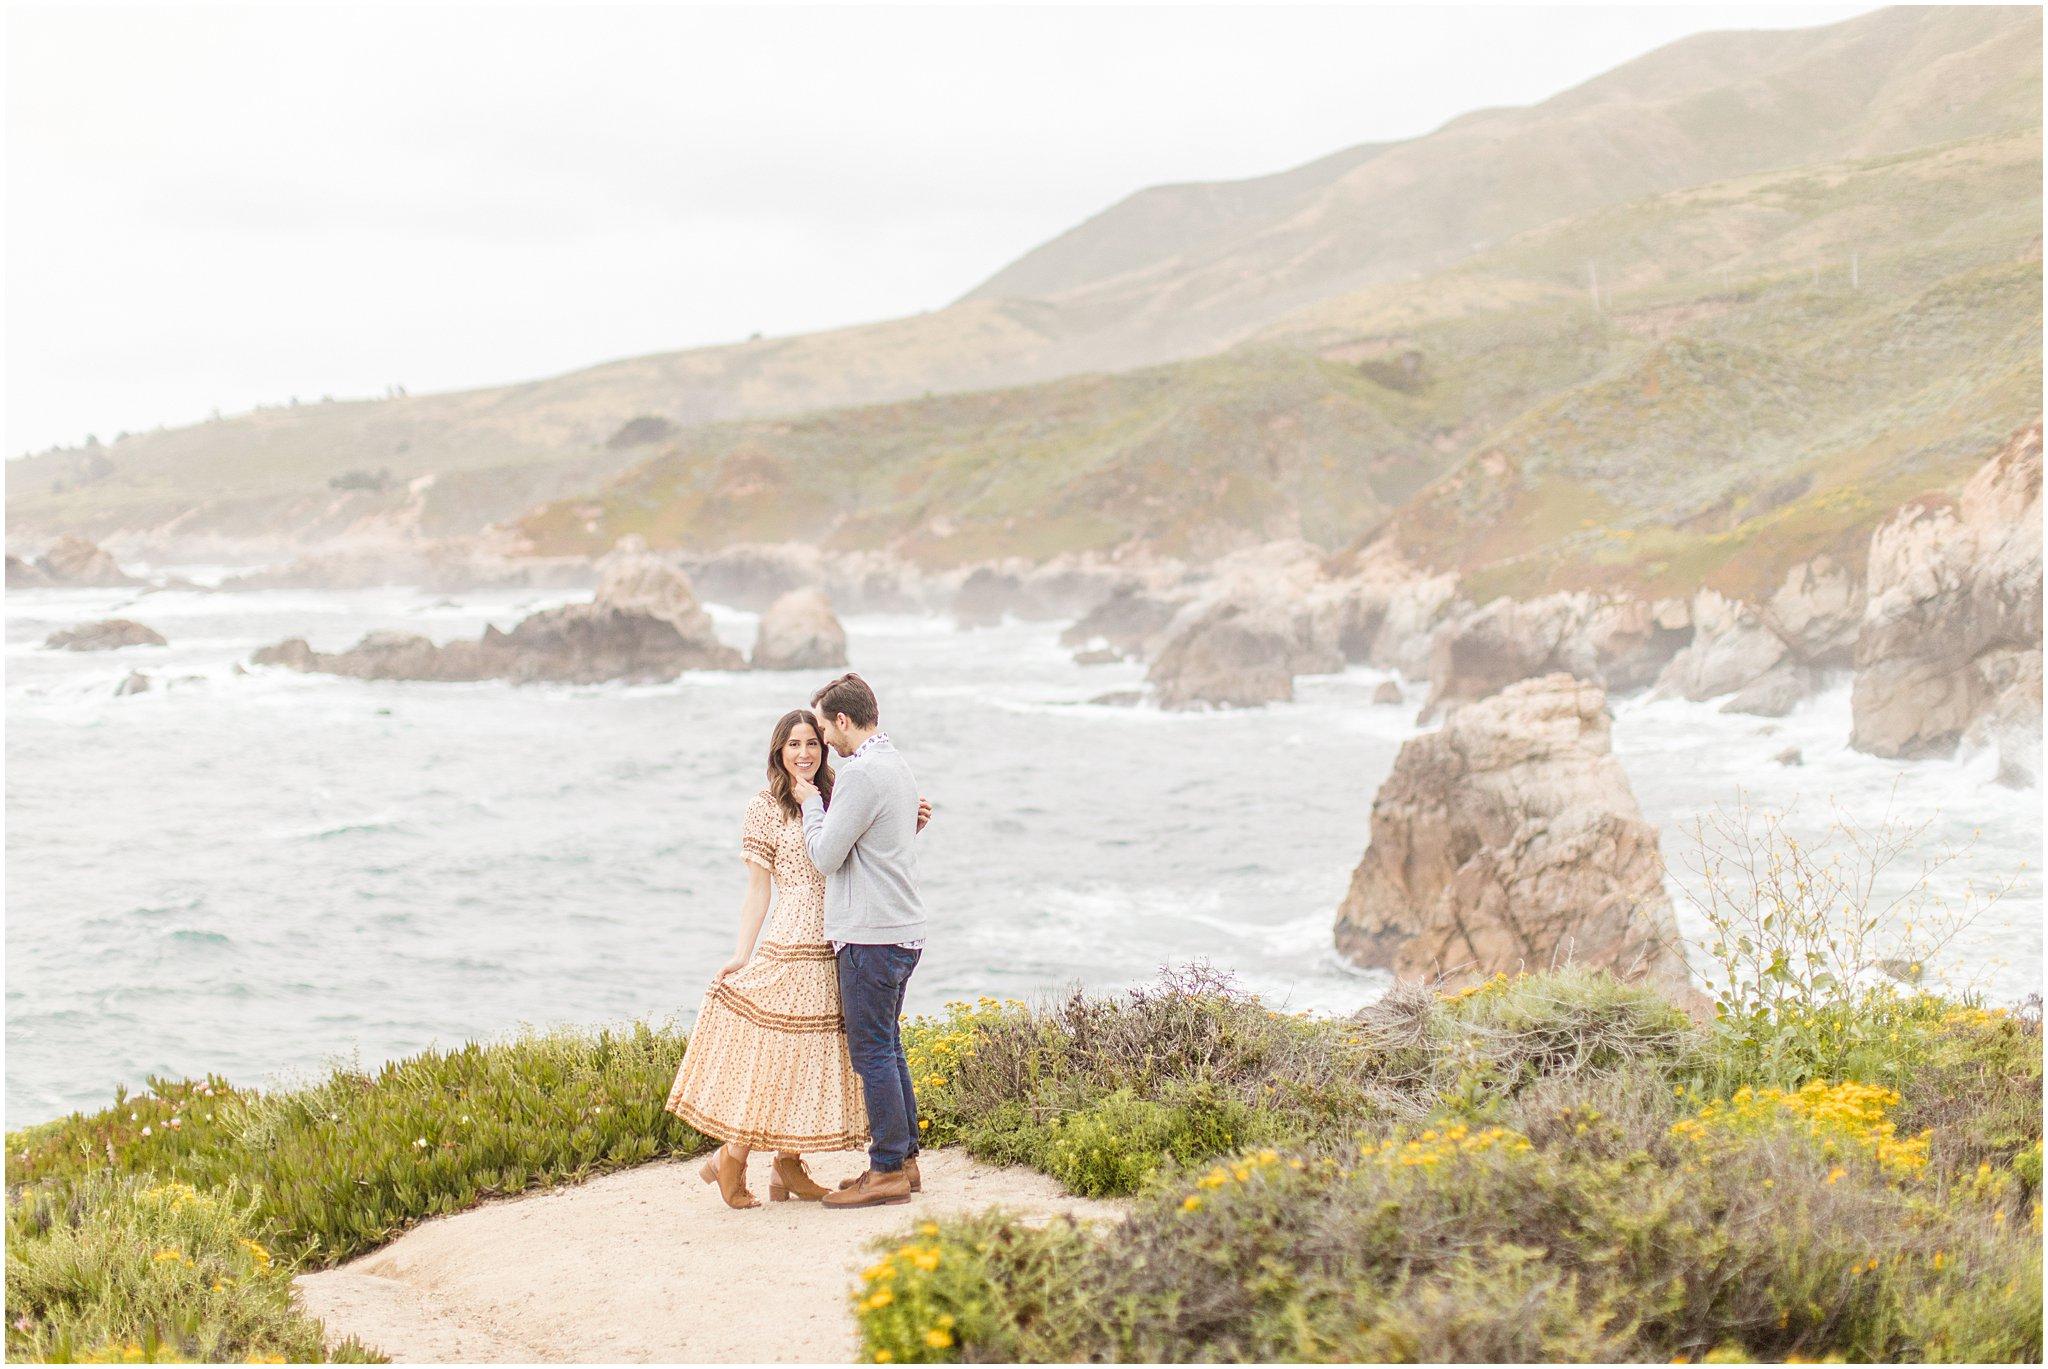 2019 carmel highlands garrapata state park couples portrait session bay area wedding photographer_0017.jpg